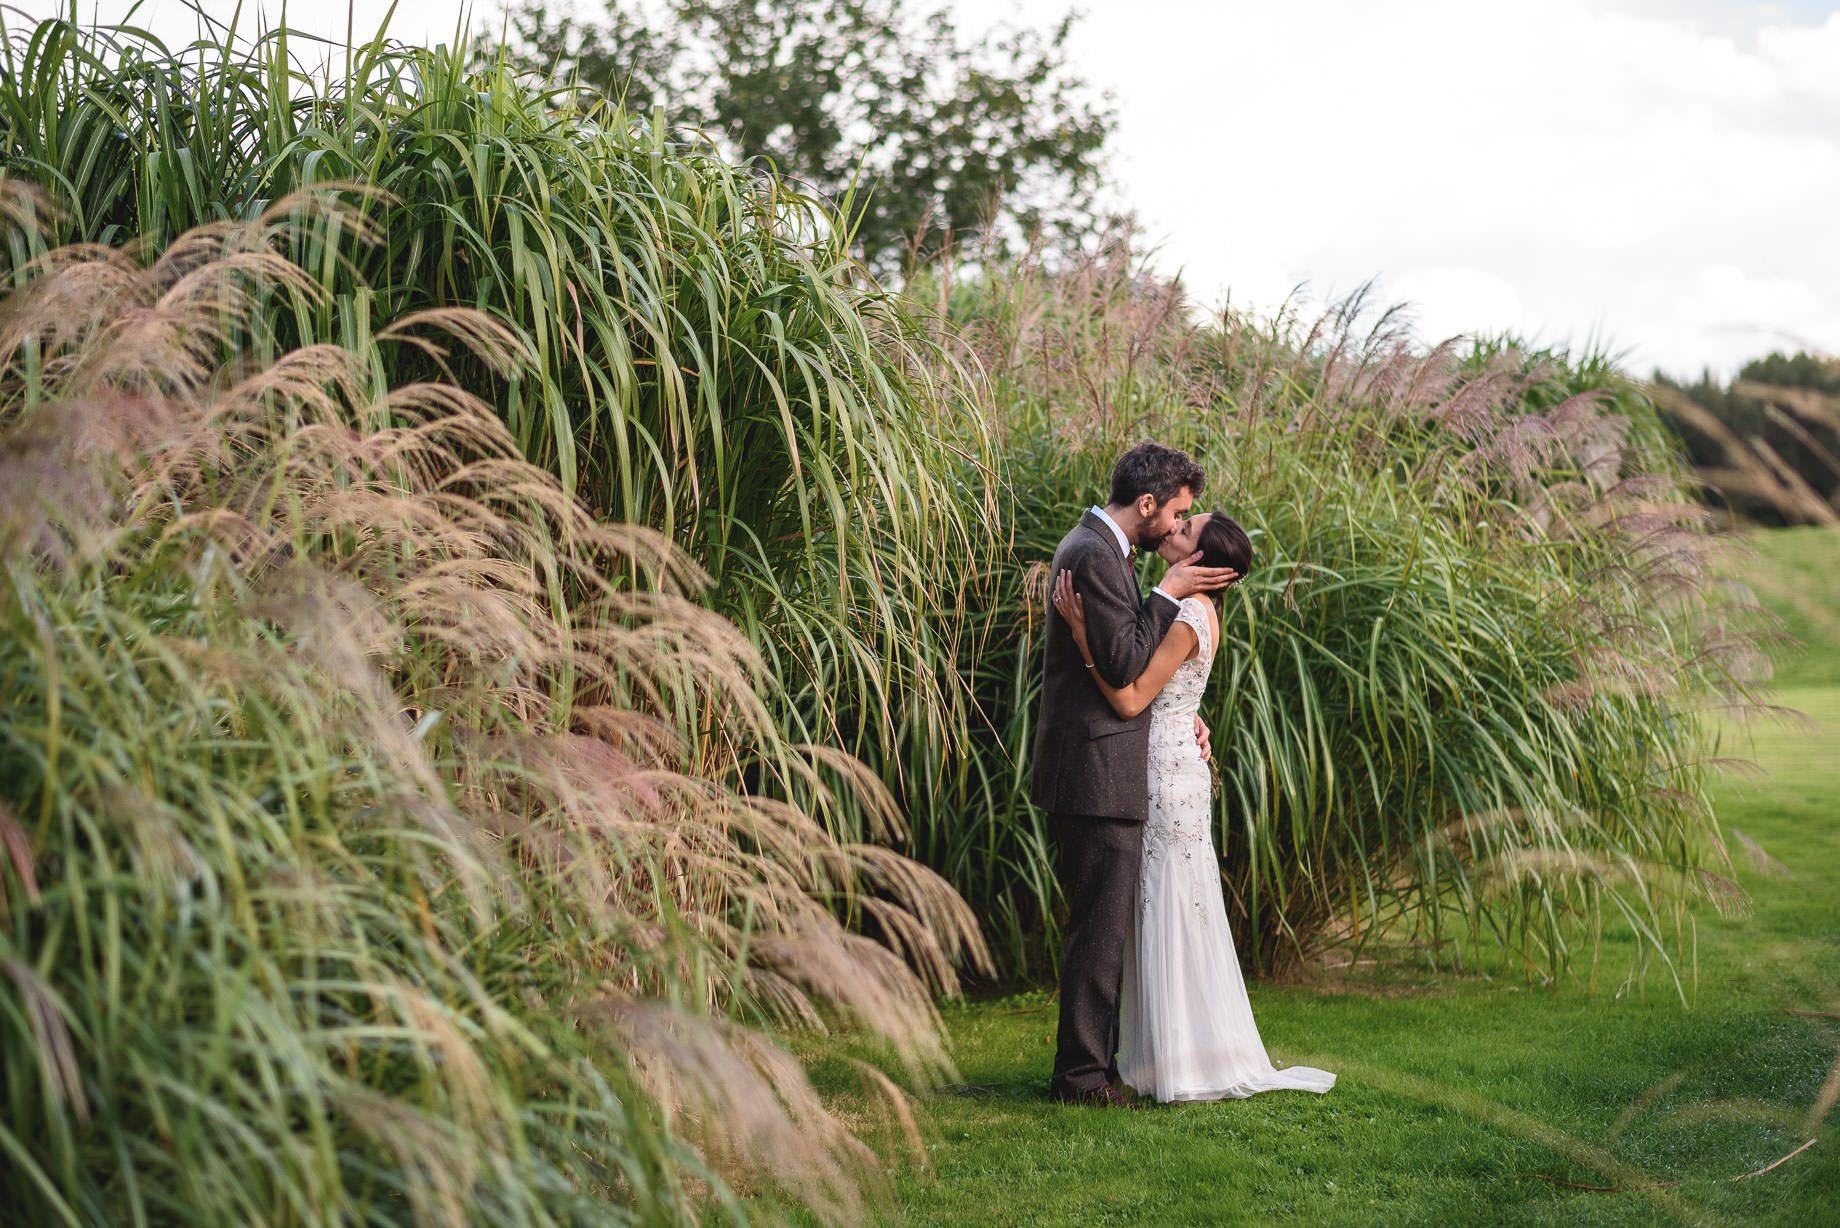 bury-court-barn-wedding-photography-guy-collier-photography-nadia-tom-101-of-184